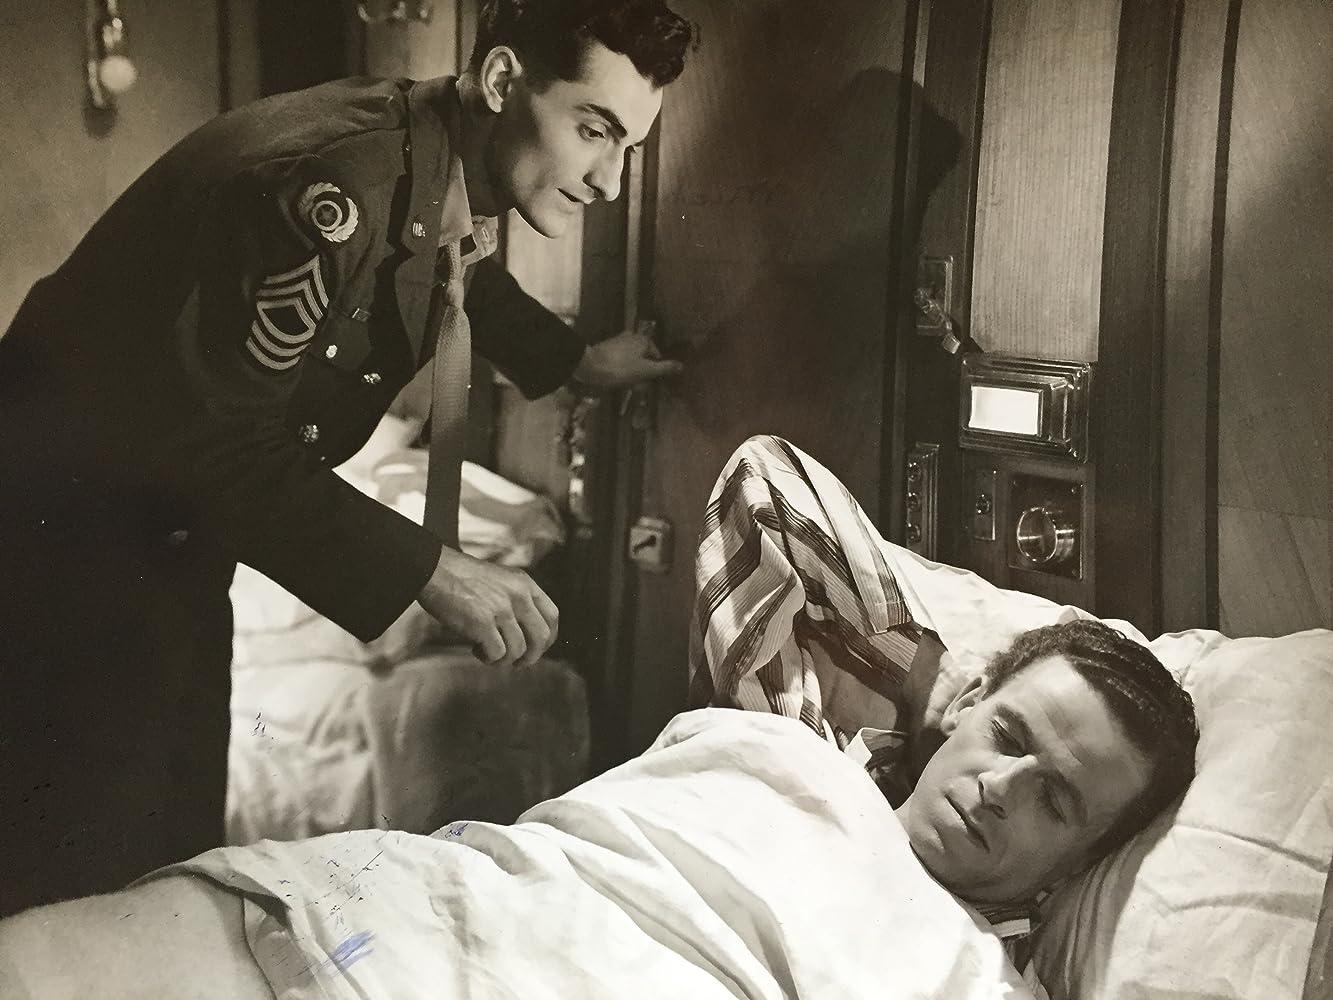 Bonar Colleano and Michael Ward in Sleeping Car to Trieste (1948)